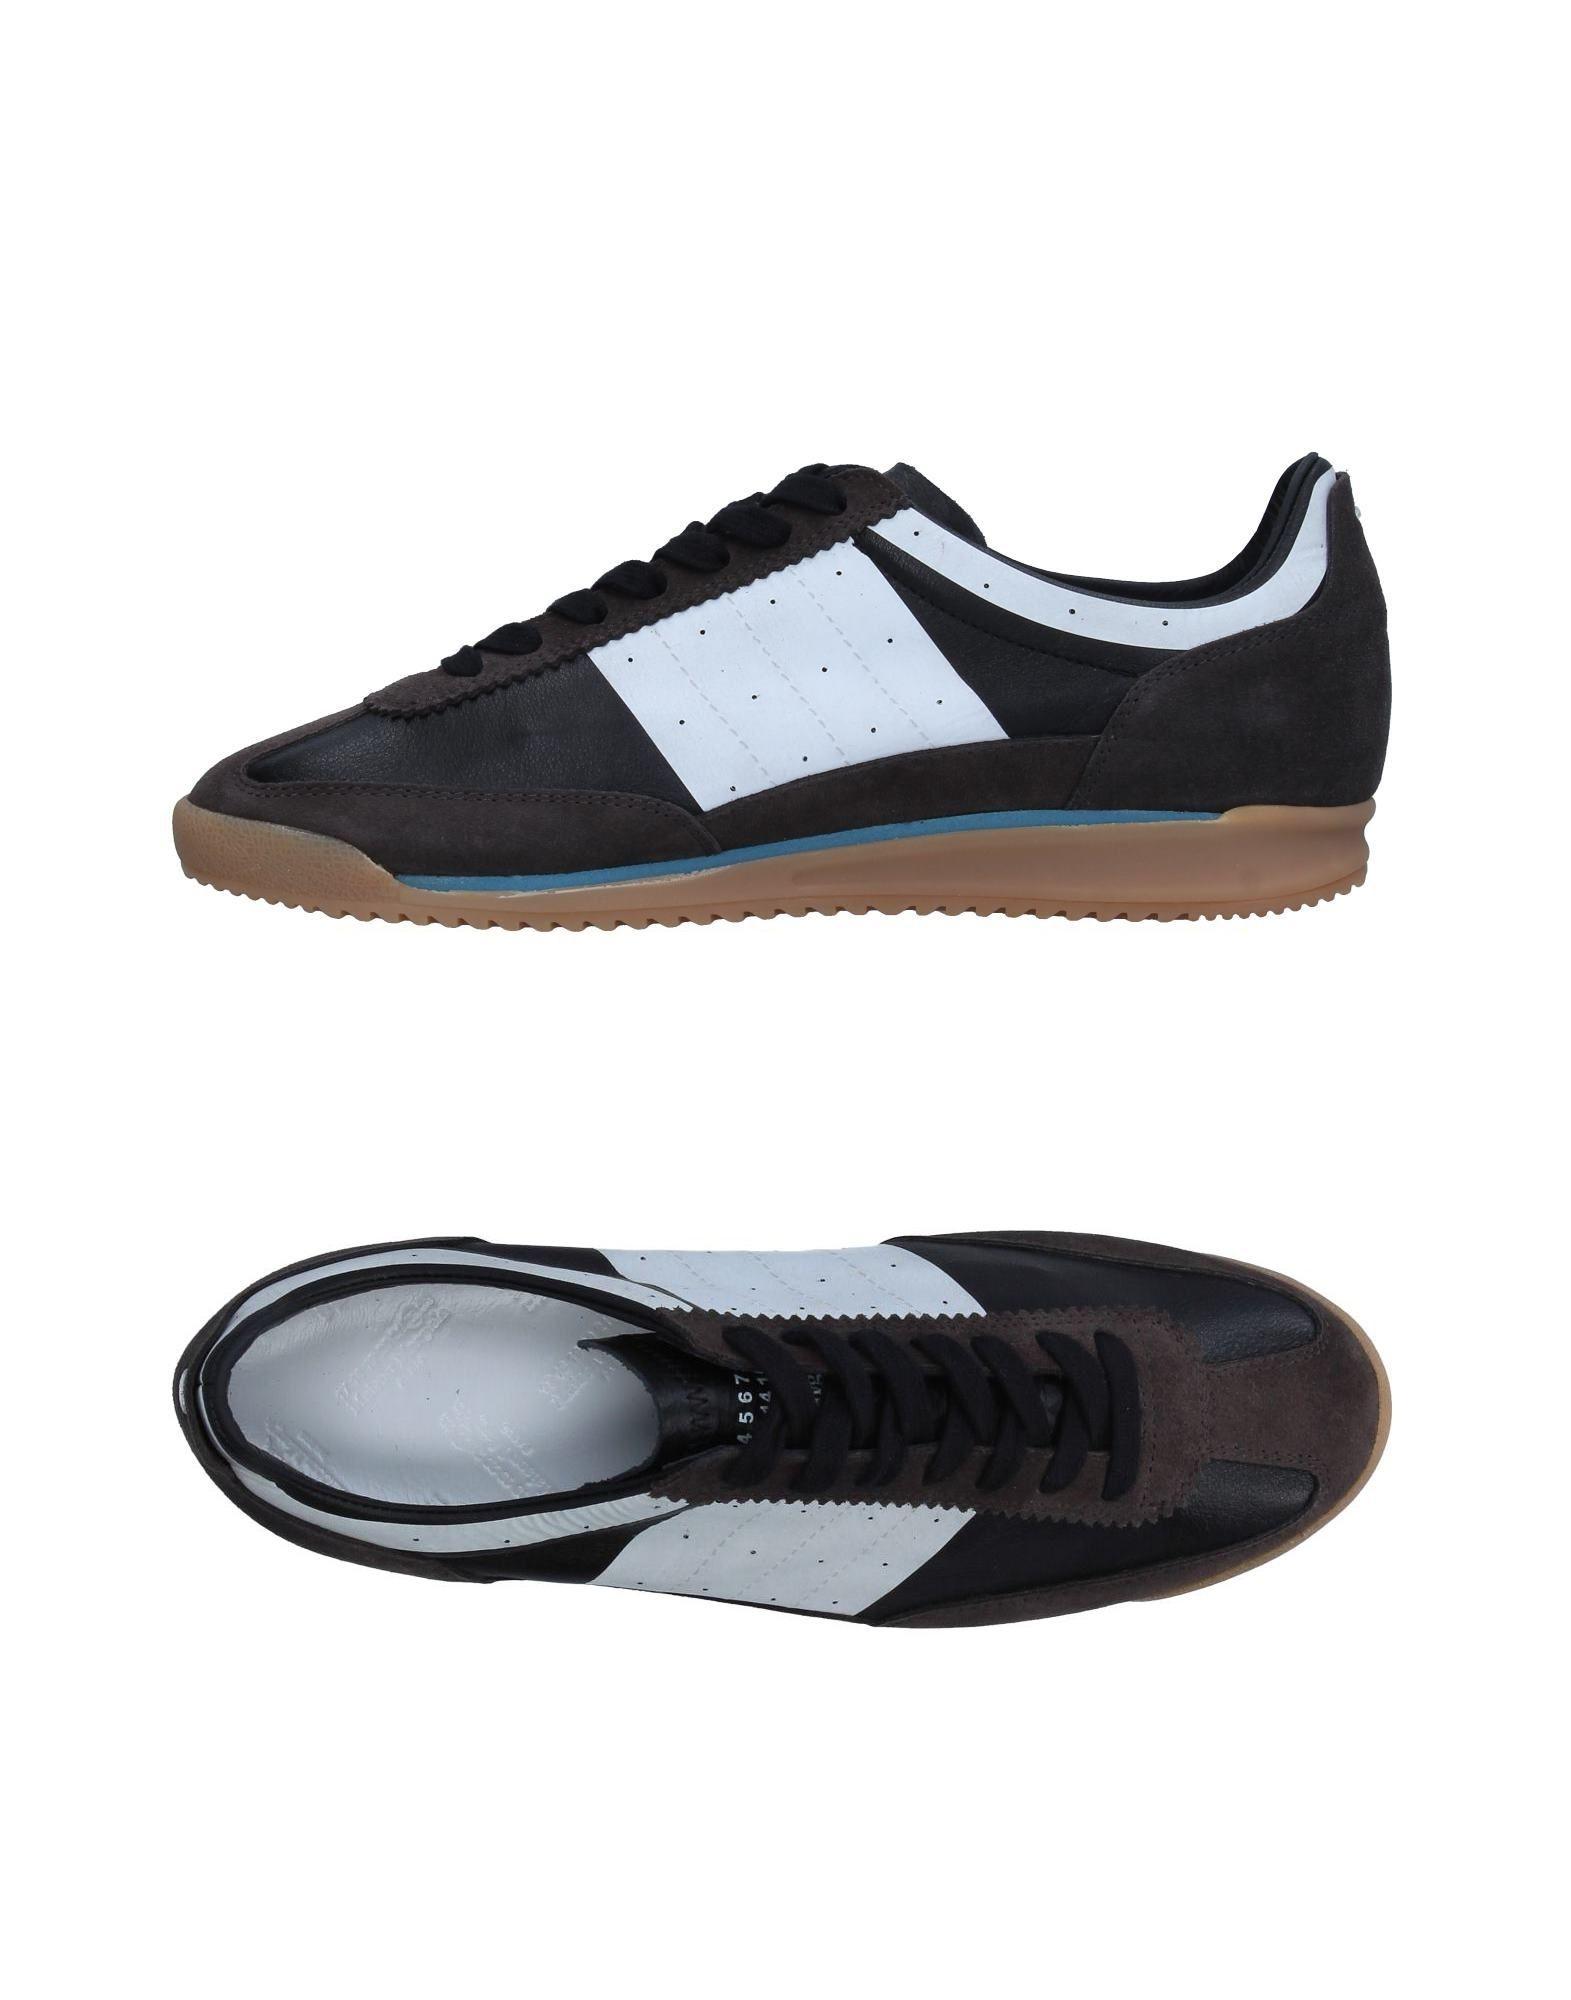 Maison 11334363GL Margiela Sneakers Herren  11334363GL Maison  dfd5a5